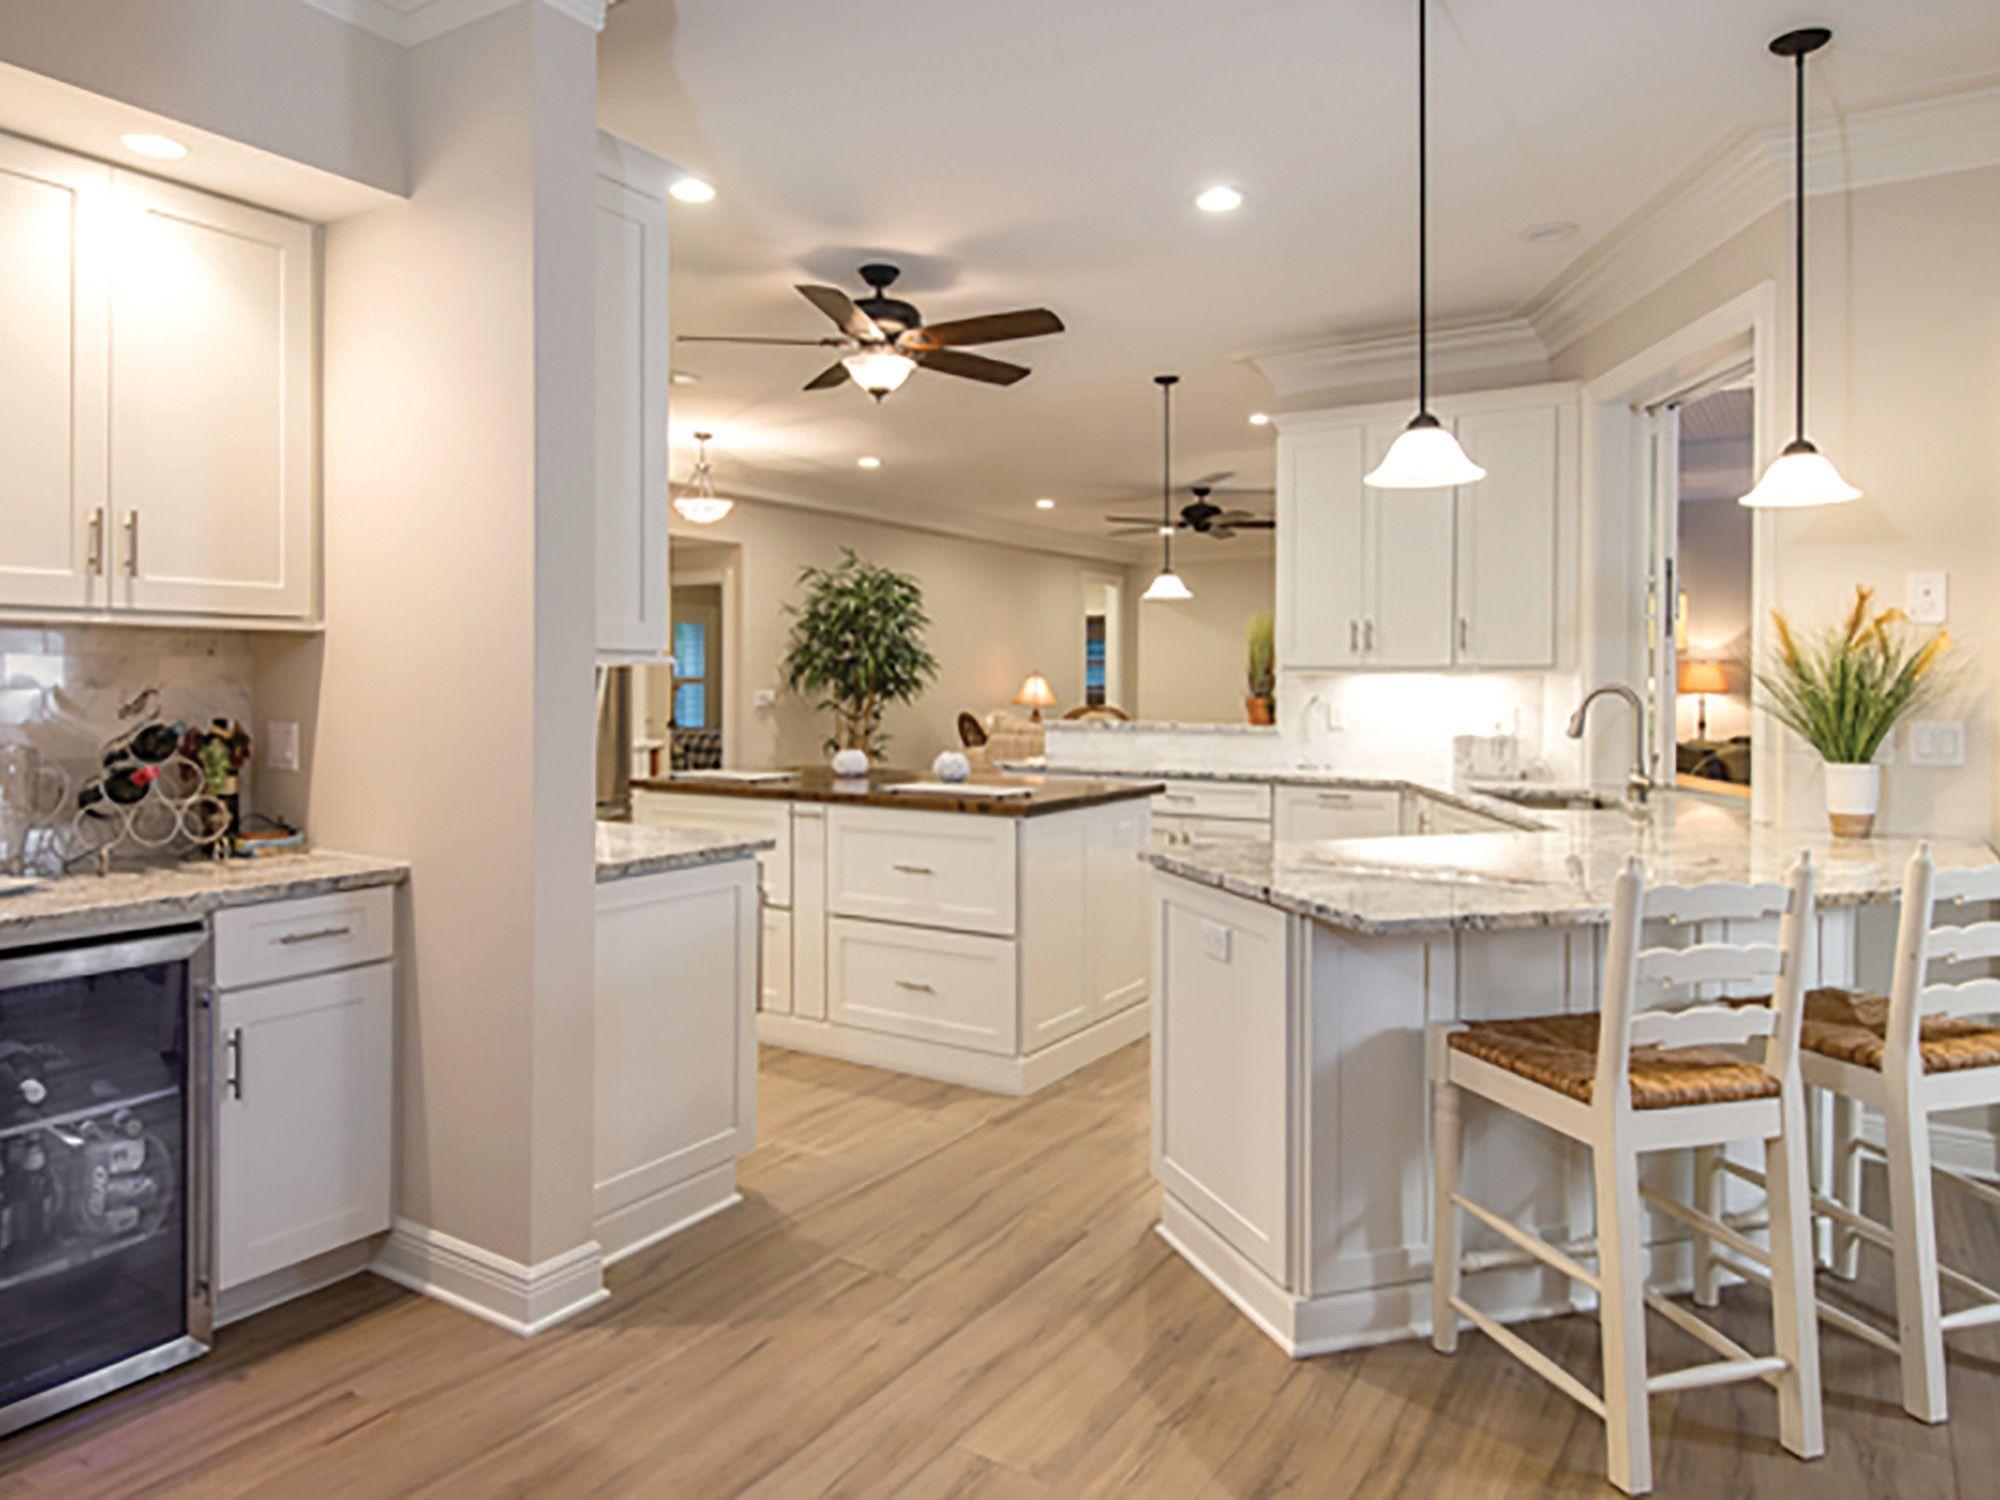 Shaker White Cabinets - New England Kitchen Update ...